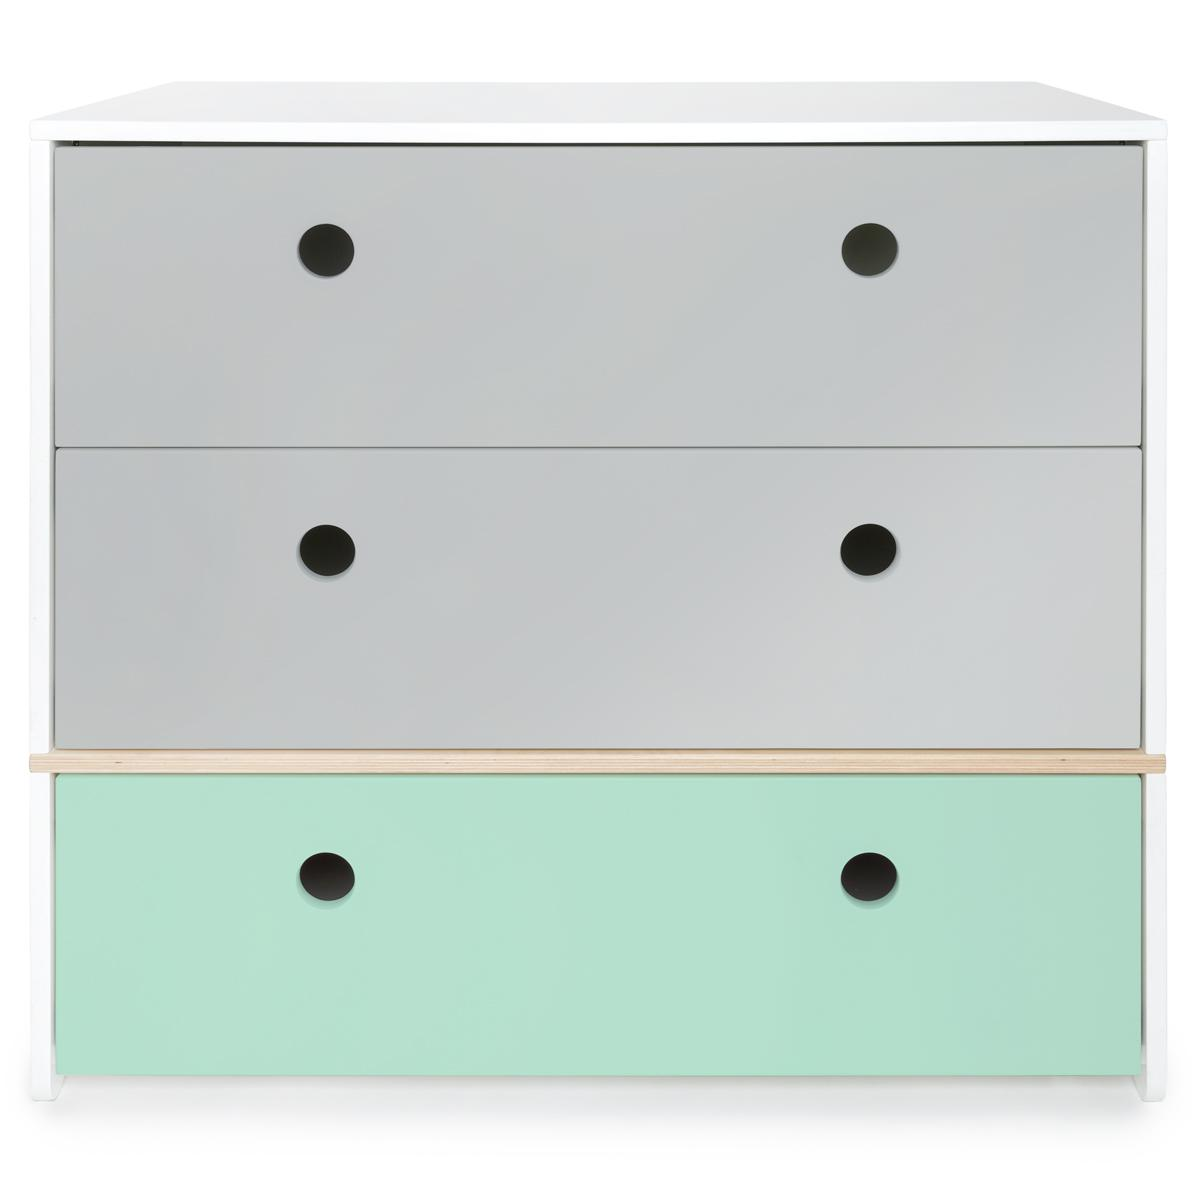 Kommode COLORFLEX Abitare Kids Schubladen Farben pearl grey-pearl grey-mint